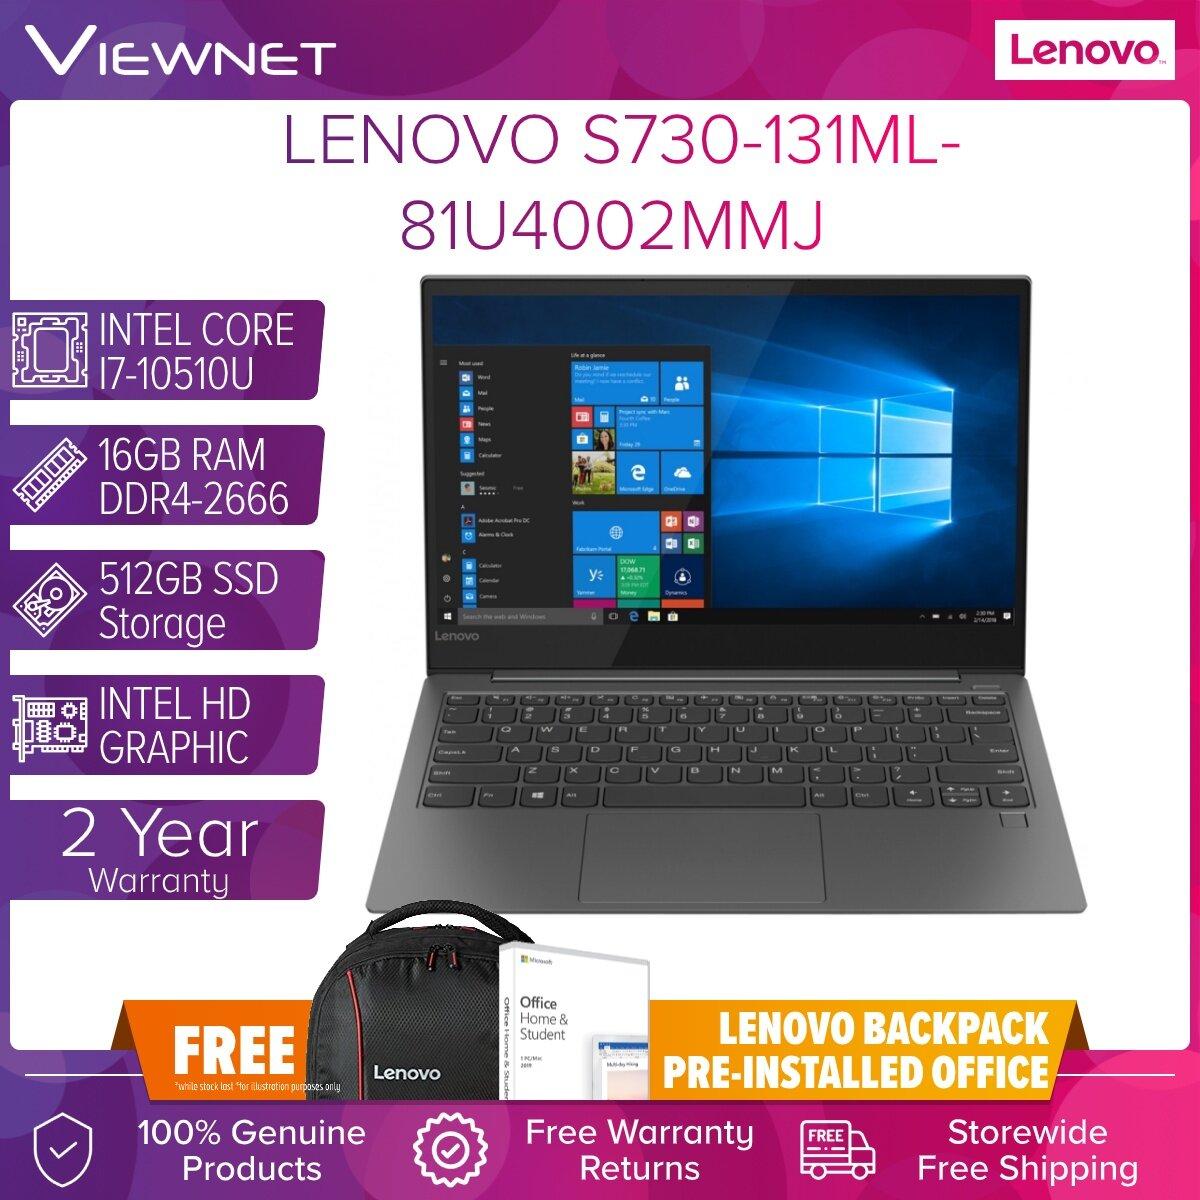 LENOVO S730-131ML-81U4002MMJ INTEL CORE I7-10510U/16GB DDR4/512GB M.2/INTEL HD/W10/13.3'/IRON GREY FREE PRE-INSTALLED OFFICE #2 YEARS ON-SITE WARRANTY(HOTLINE:1800-22-0116)